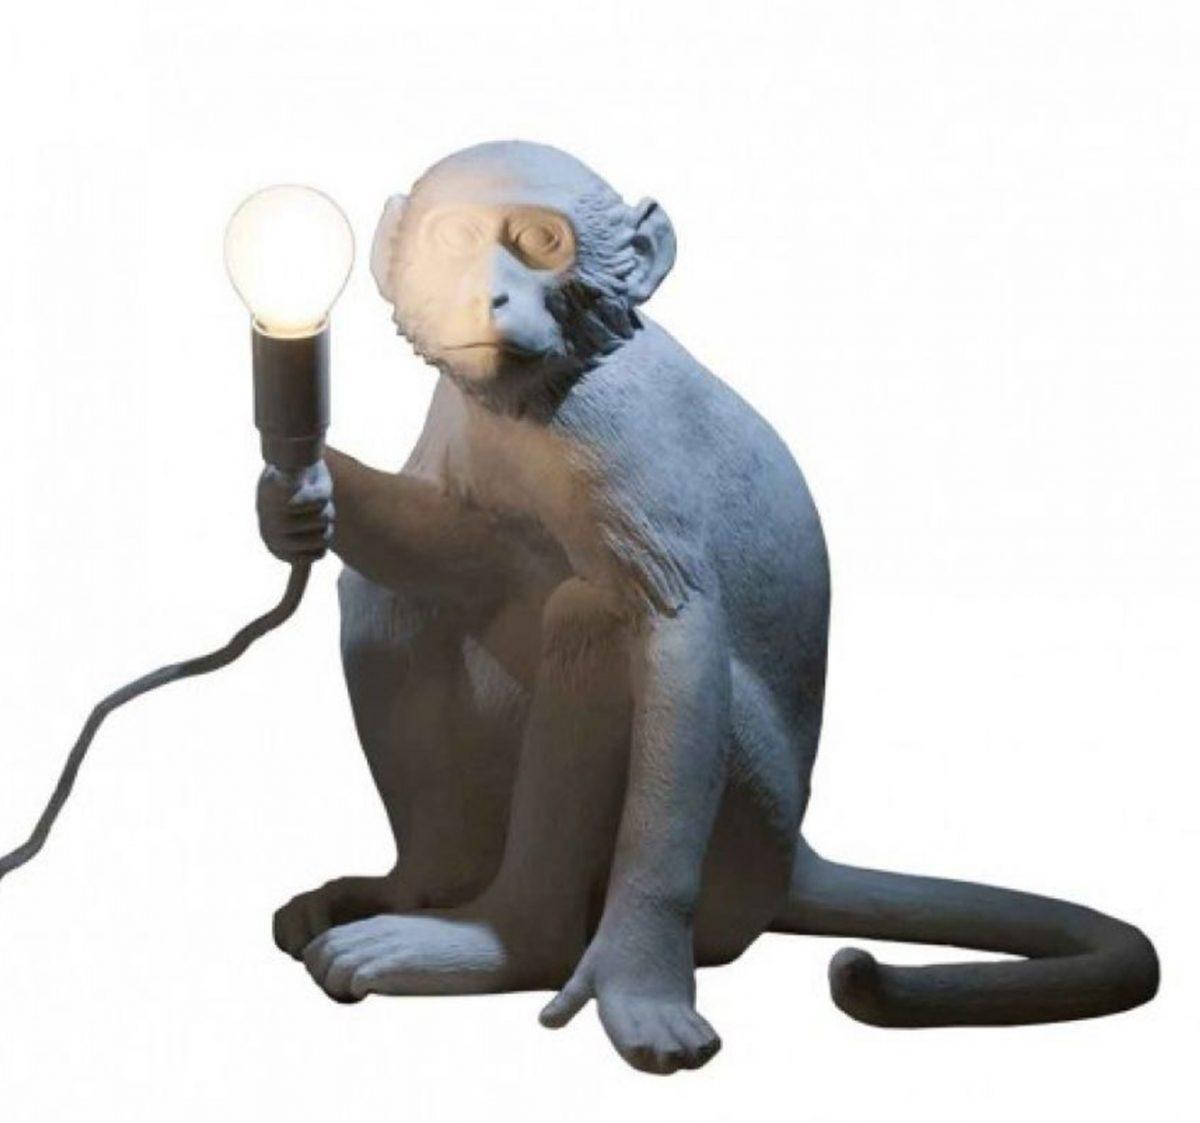 5. Sitting Monkey Lamp, M.R. Malerba for Seletti